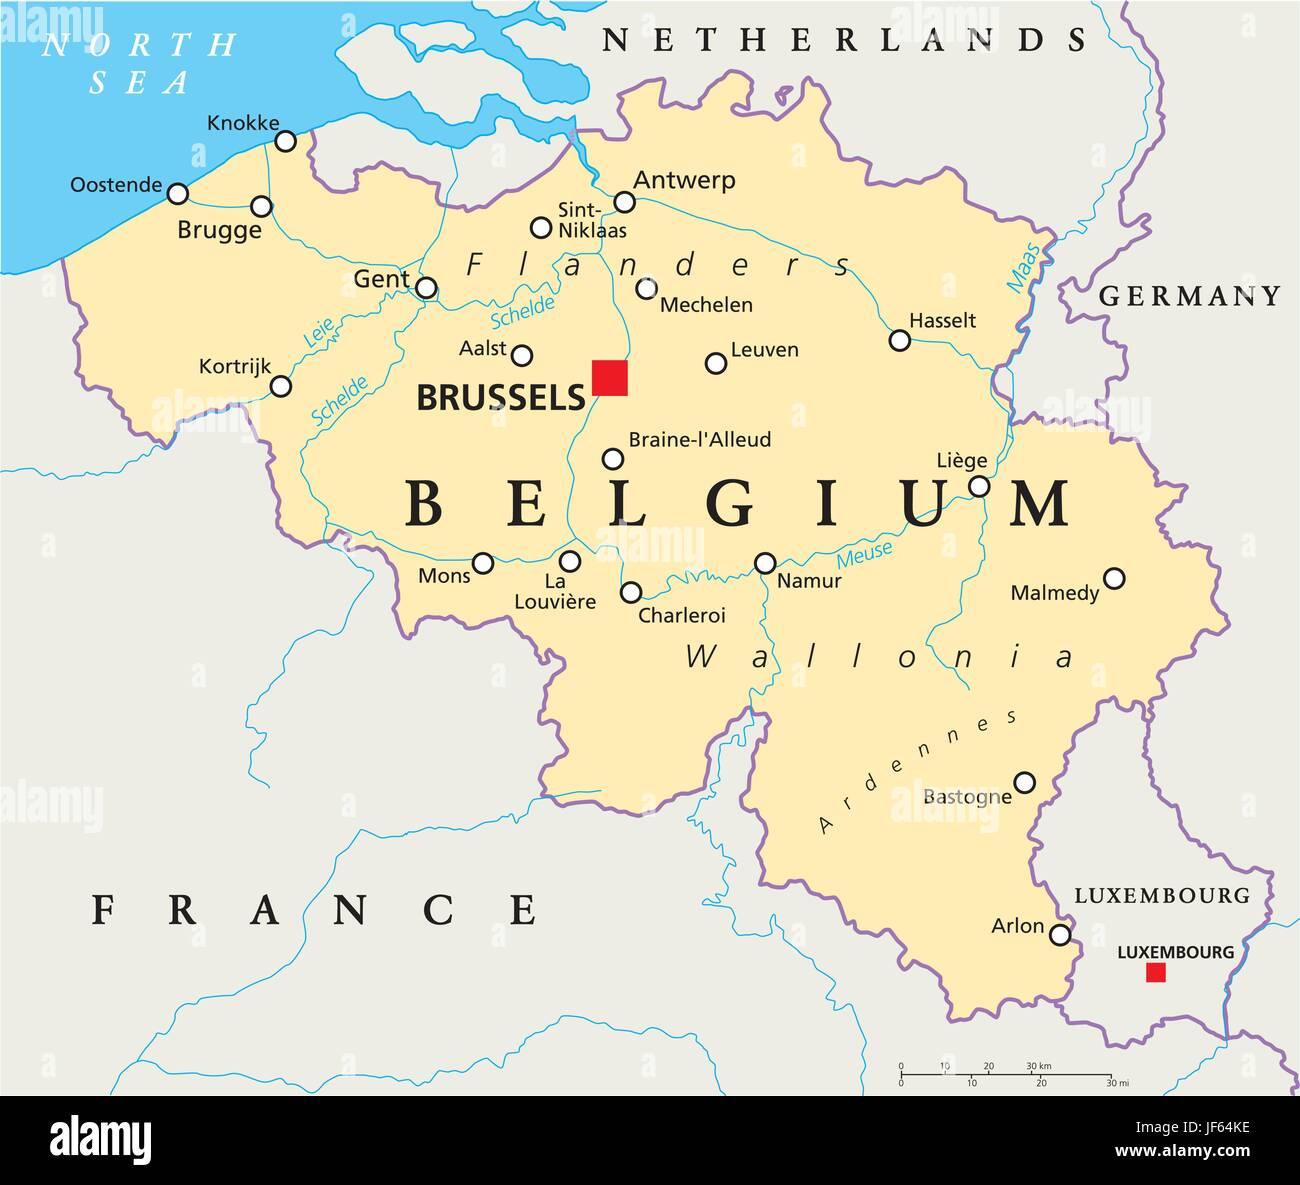 belgien br ssel benelux antwerpen karte atlas weltkarte reisen vektor abbildung bild. Black Bedroom Furniture Sets. Home Design Ideas